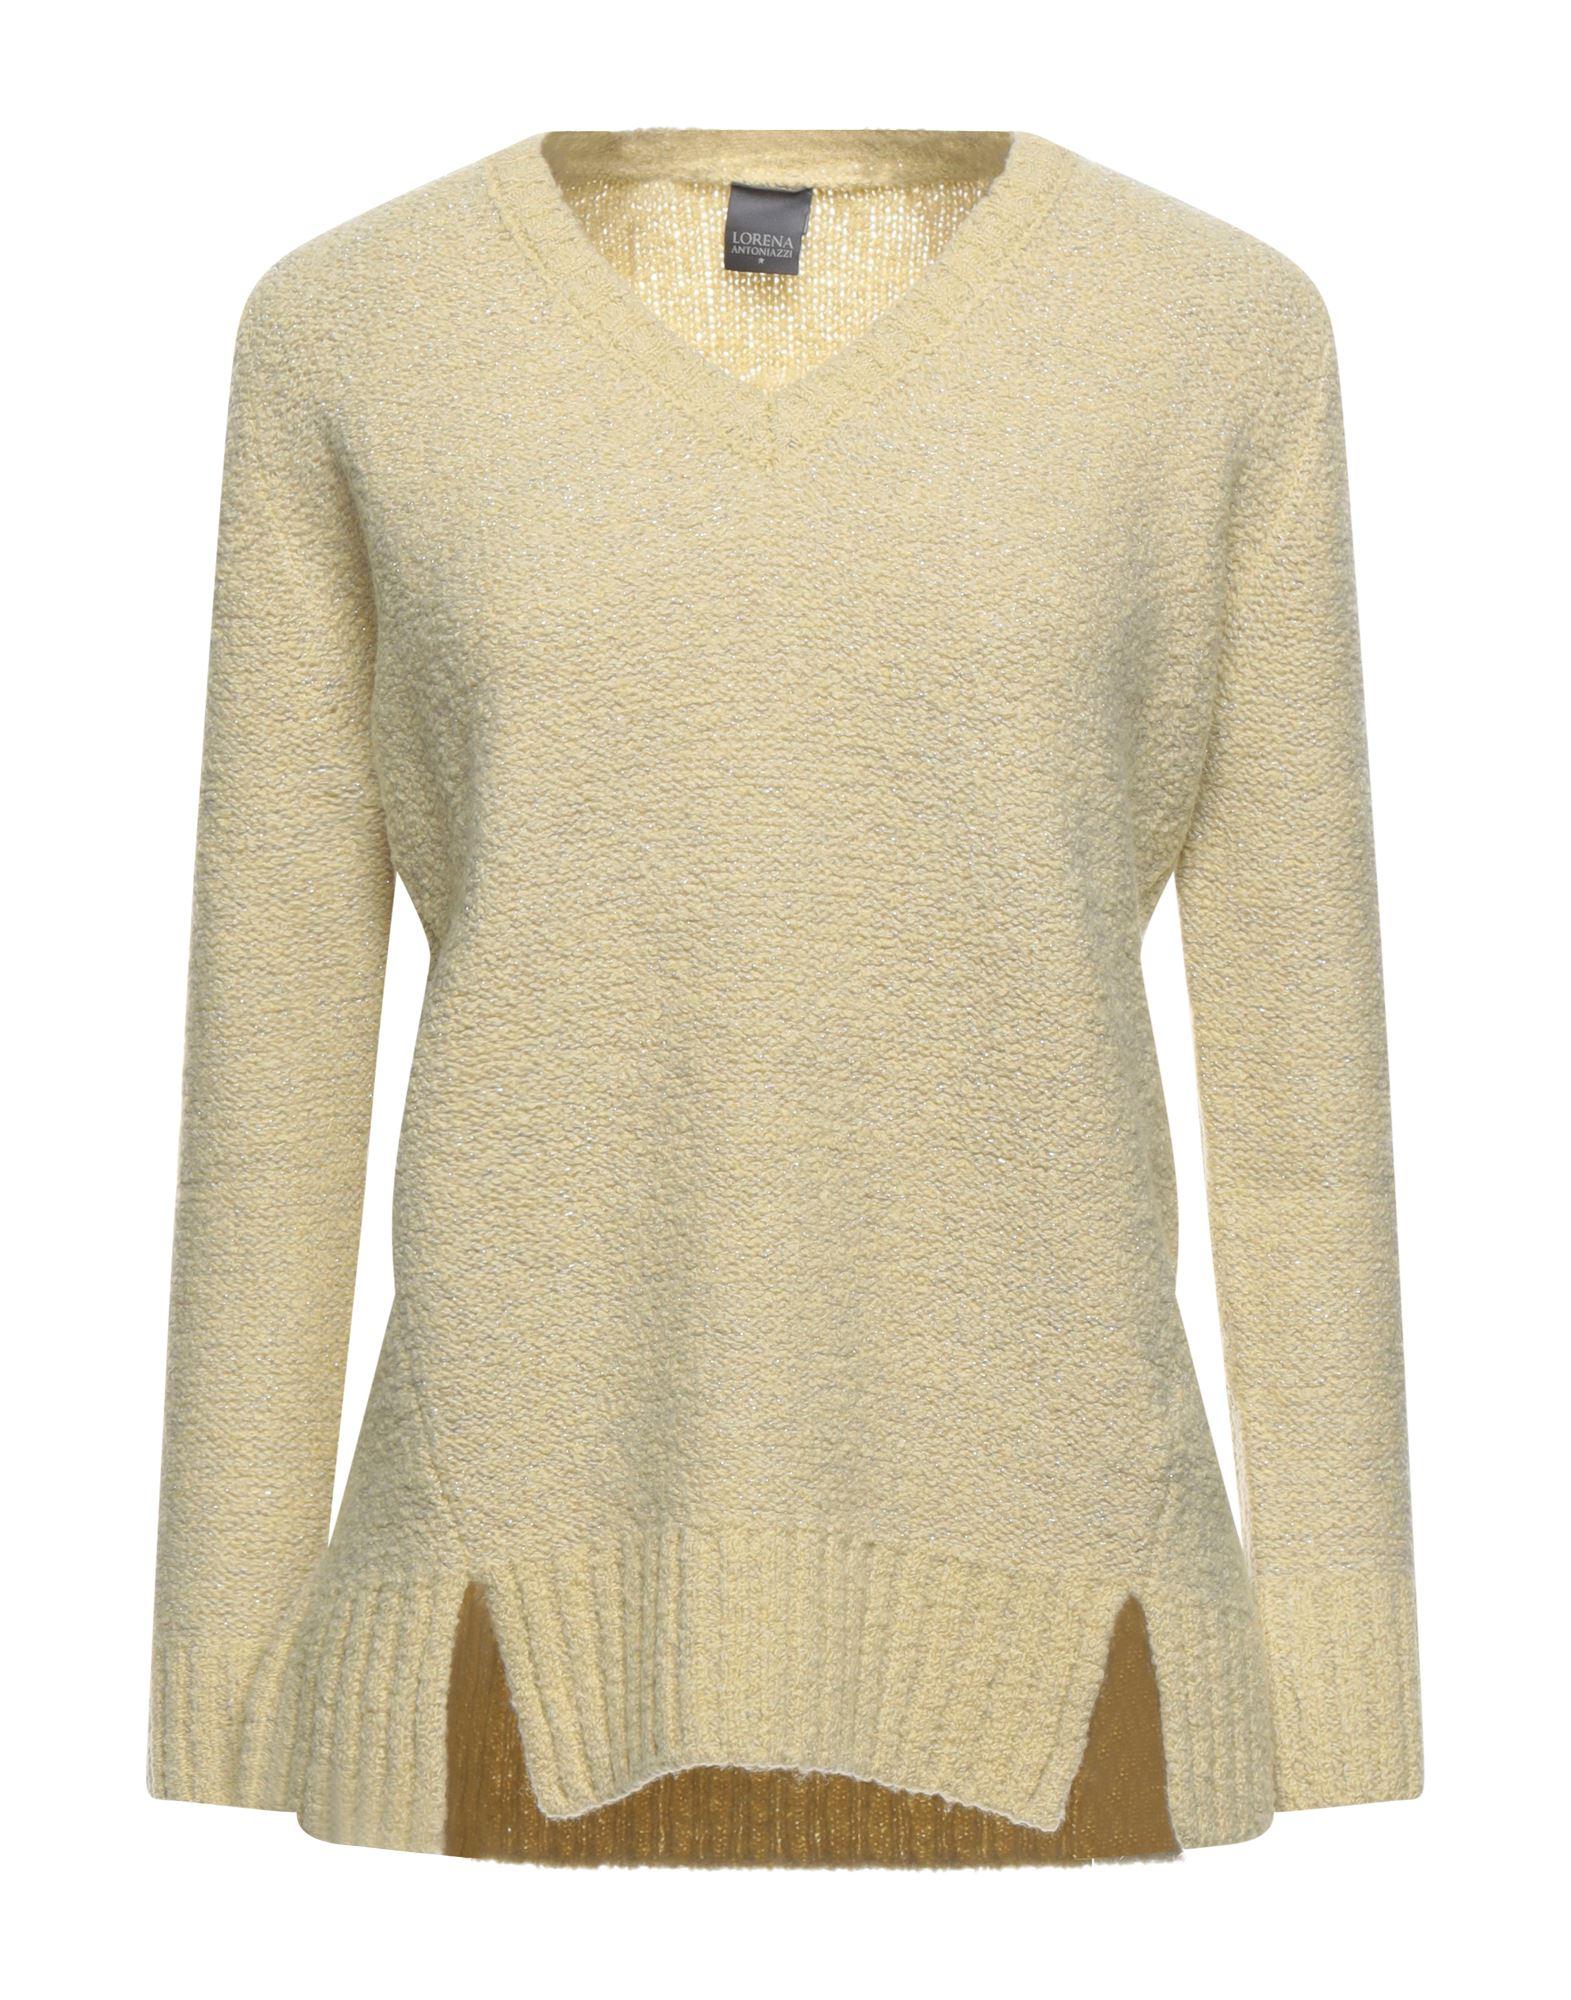 LORENA ANTONIAZZI Sweaters - Item 39938567